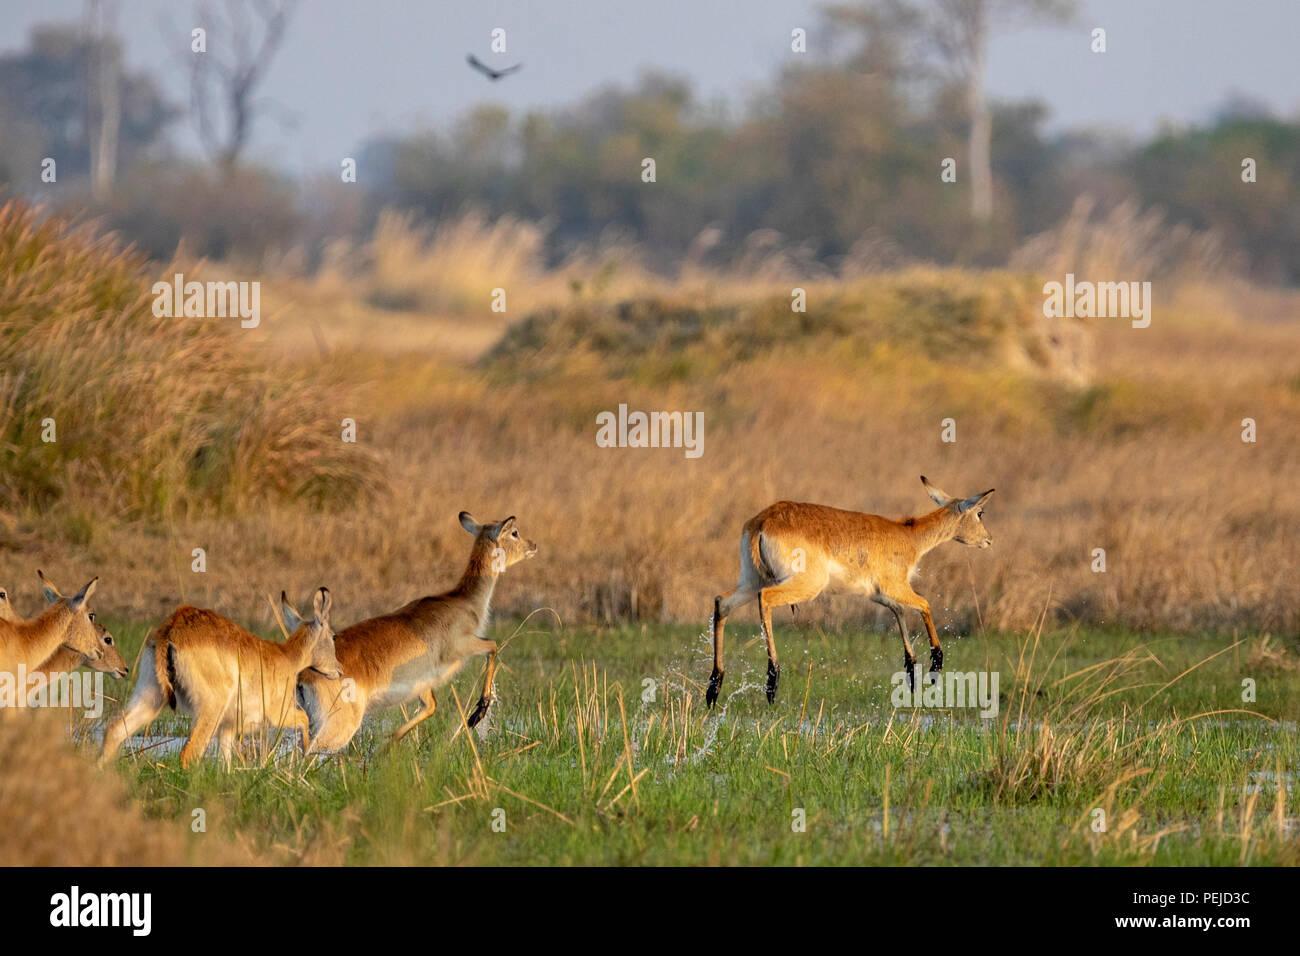 Red lechwes running in marsh in Khwai Private Reserve, Okavango Delta, Botswana - Stock Image